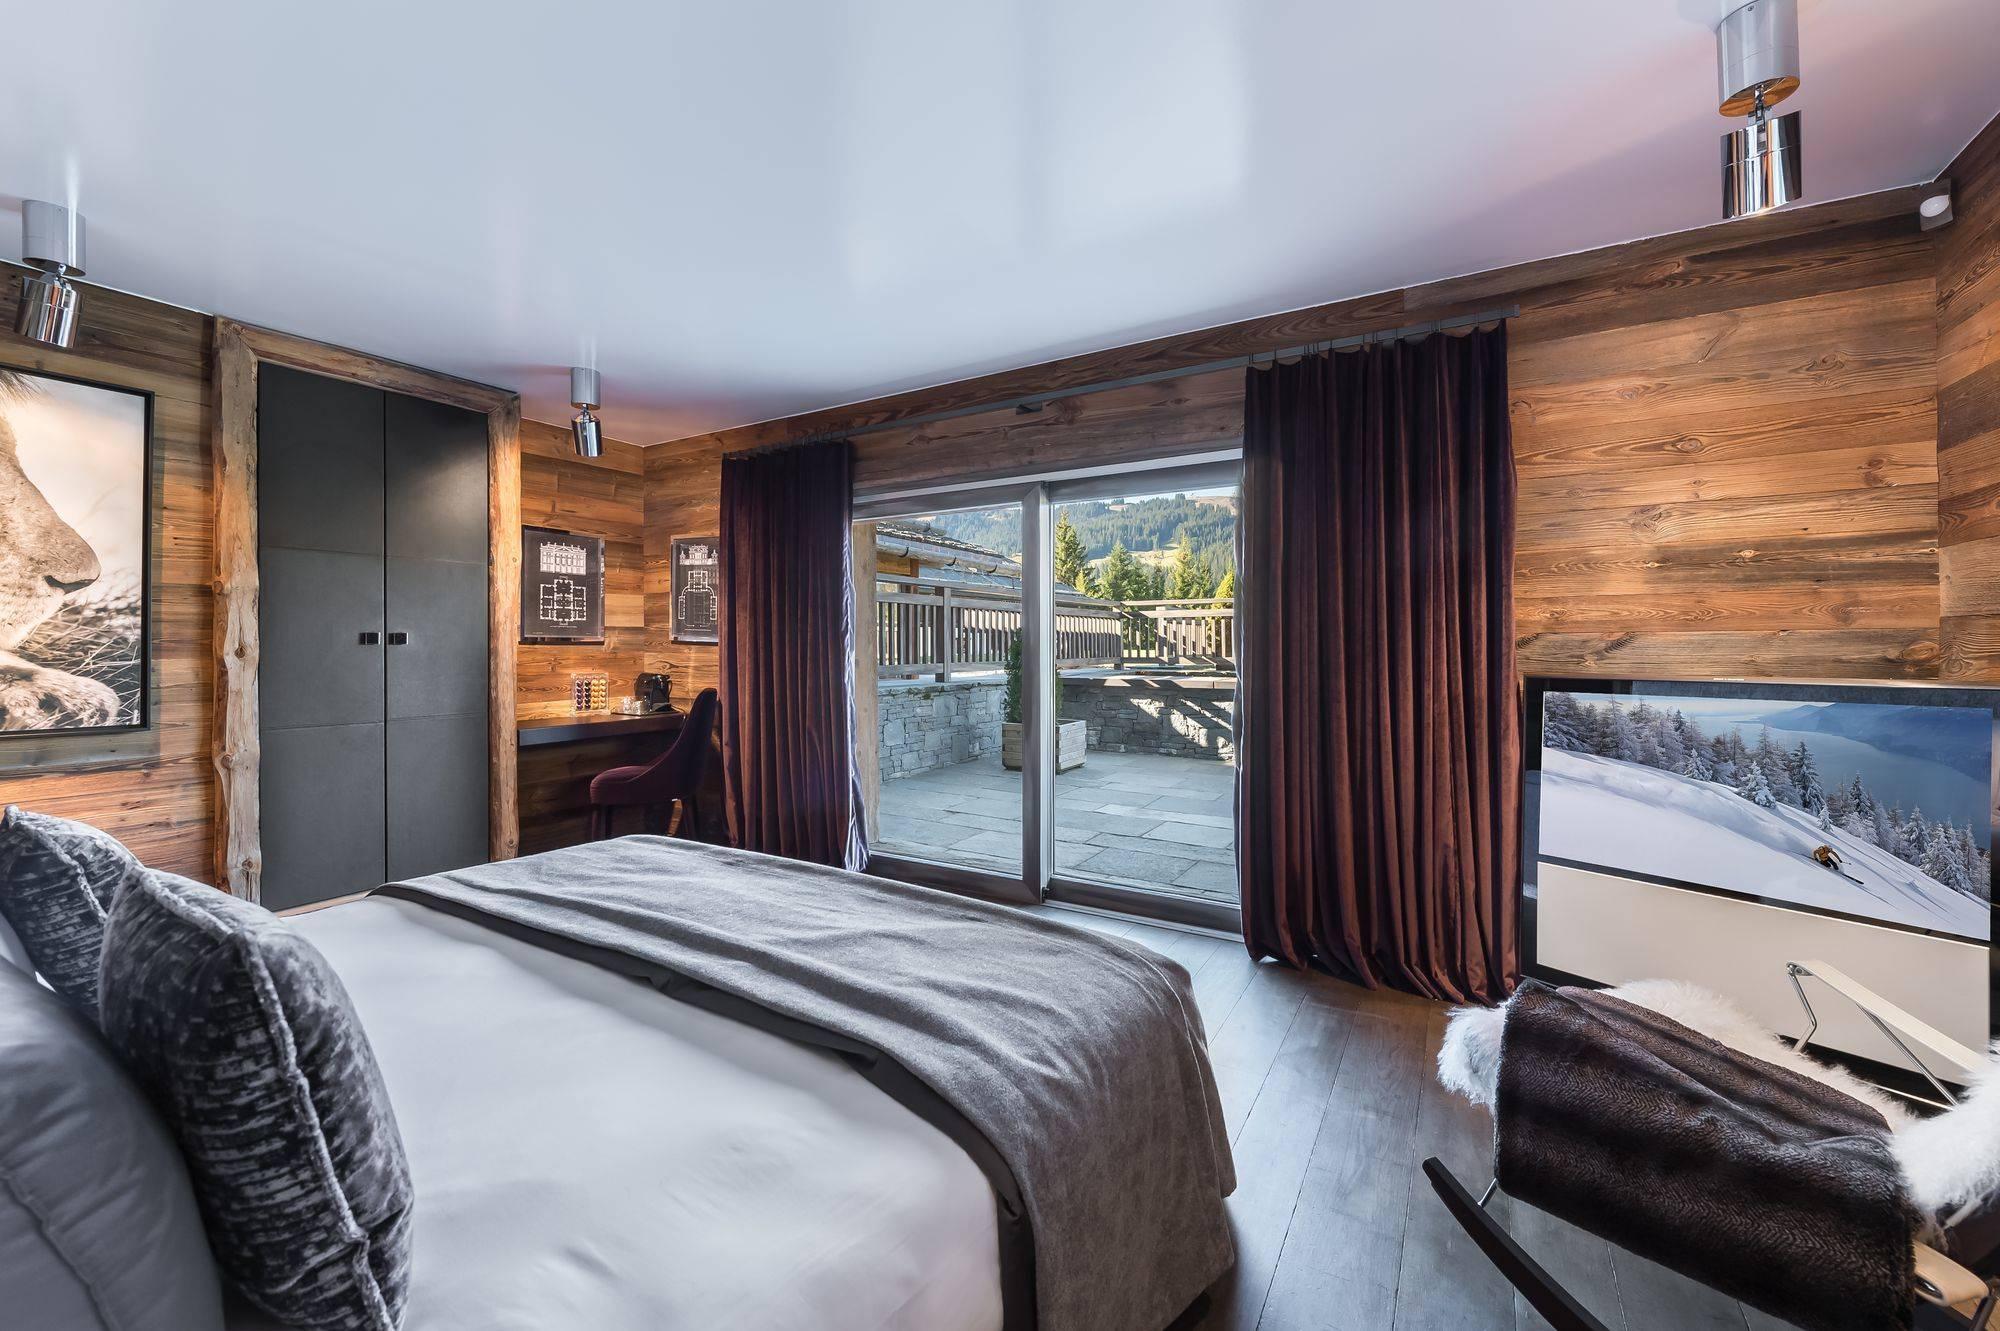 Lovelydays luxury service apartment rental - Megève - Senses Chalet - Partner - 6 bedrooms - 6 bathrooms - King bed - bd5b6c8b80e4 - Lovelydays